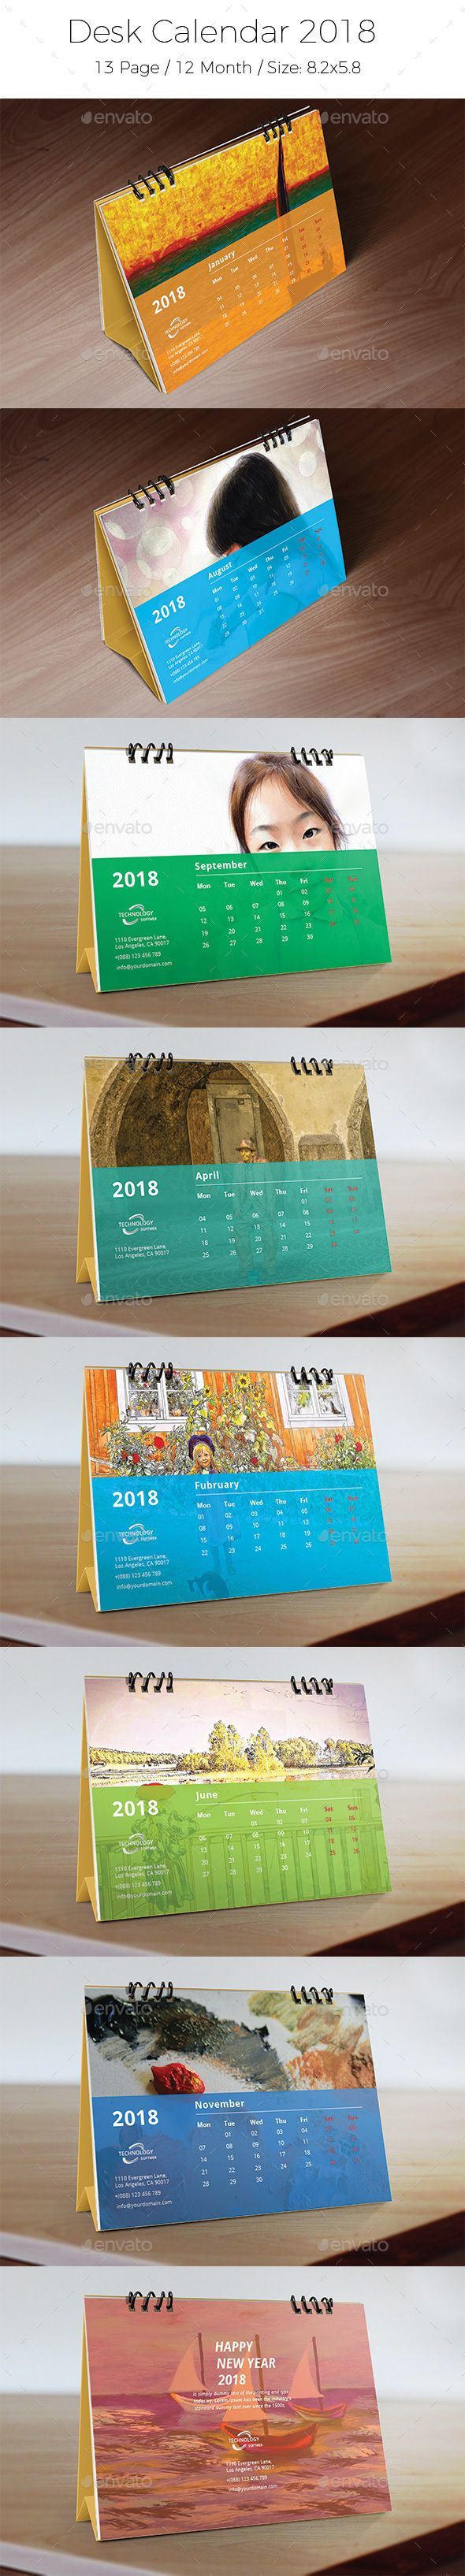 Desk Calendar 2018 Template Vector Eps Ai Illustrator Calendar